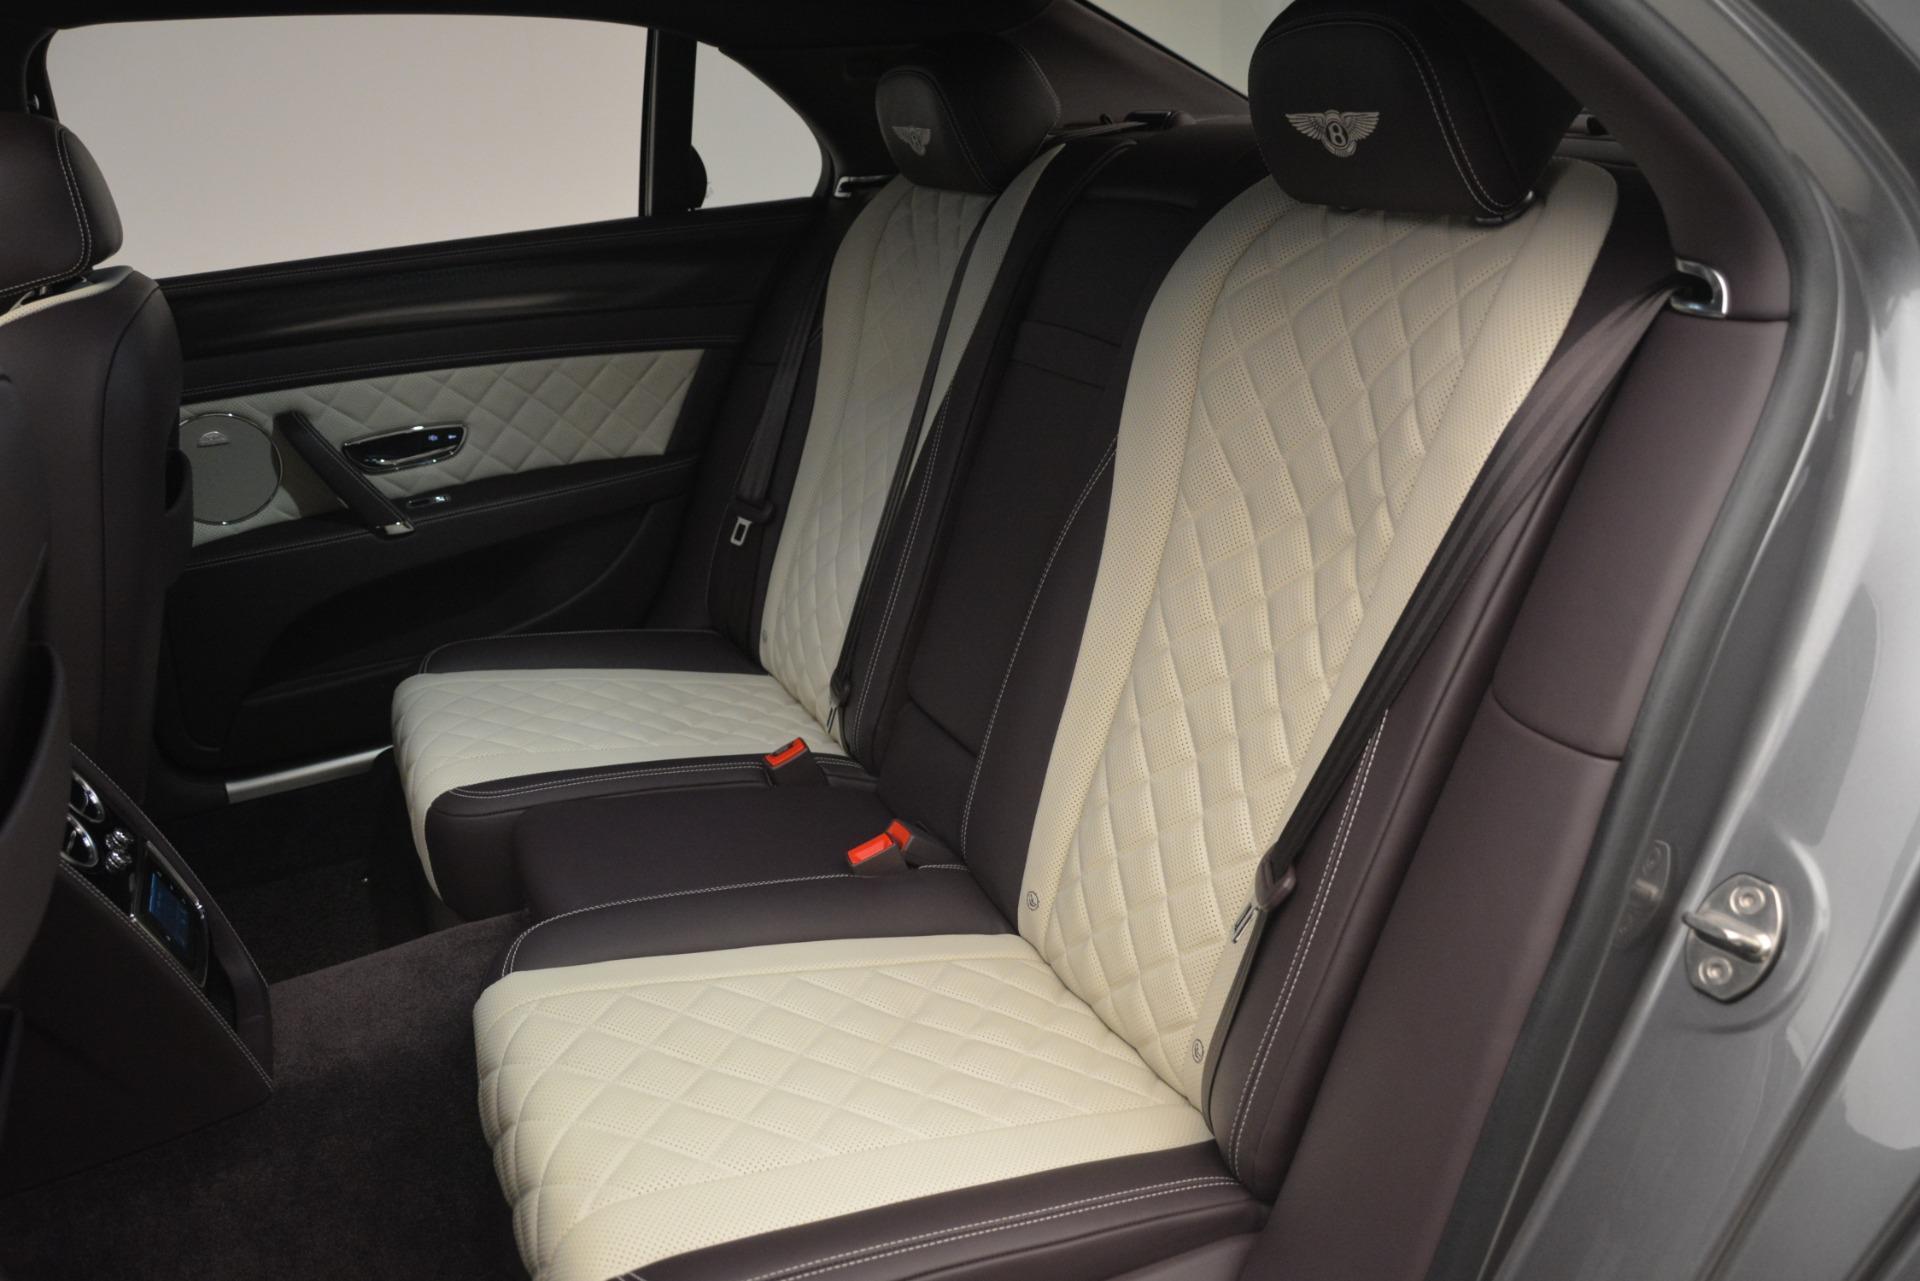 Used 2018 Bentley Flying Spur W12 S For Sale In Westport, CT 2973_p27